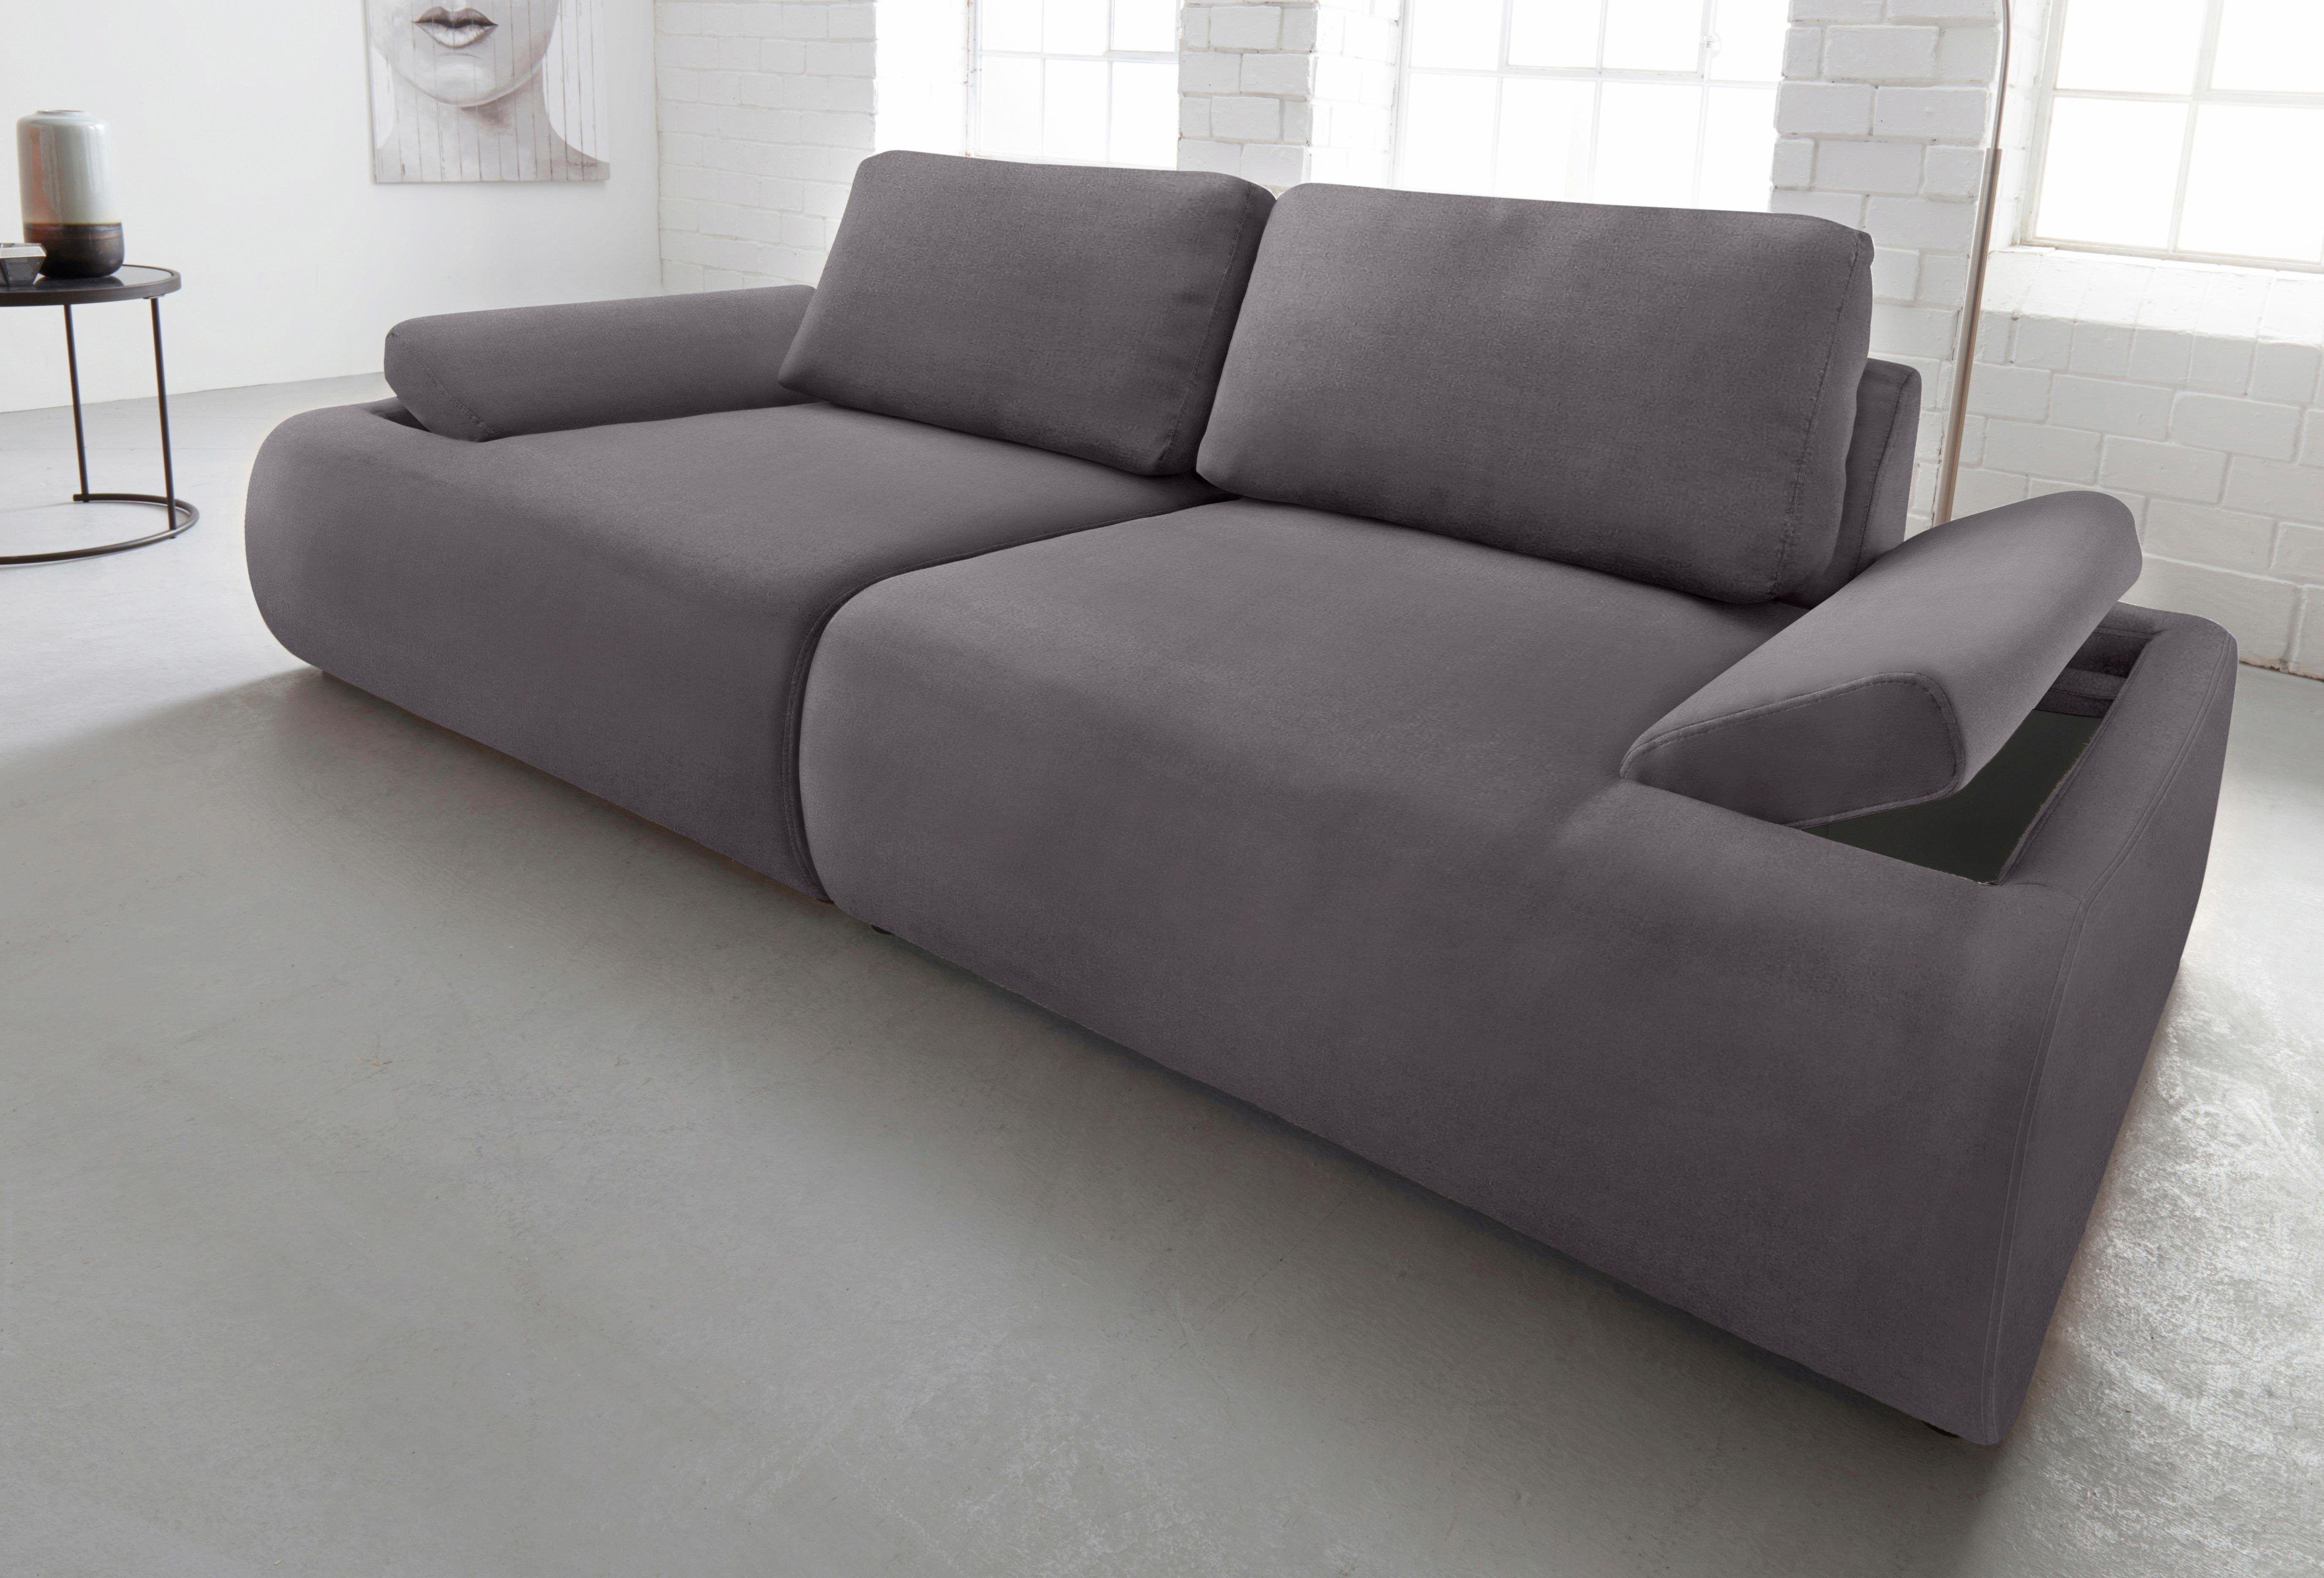 Xxl Big Sofa Ledersofa Xxl Big Sofa Vintage M Leder Couch Design